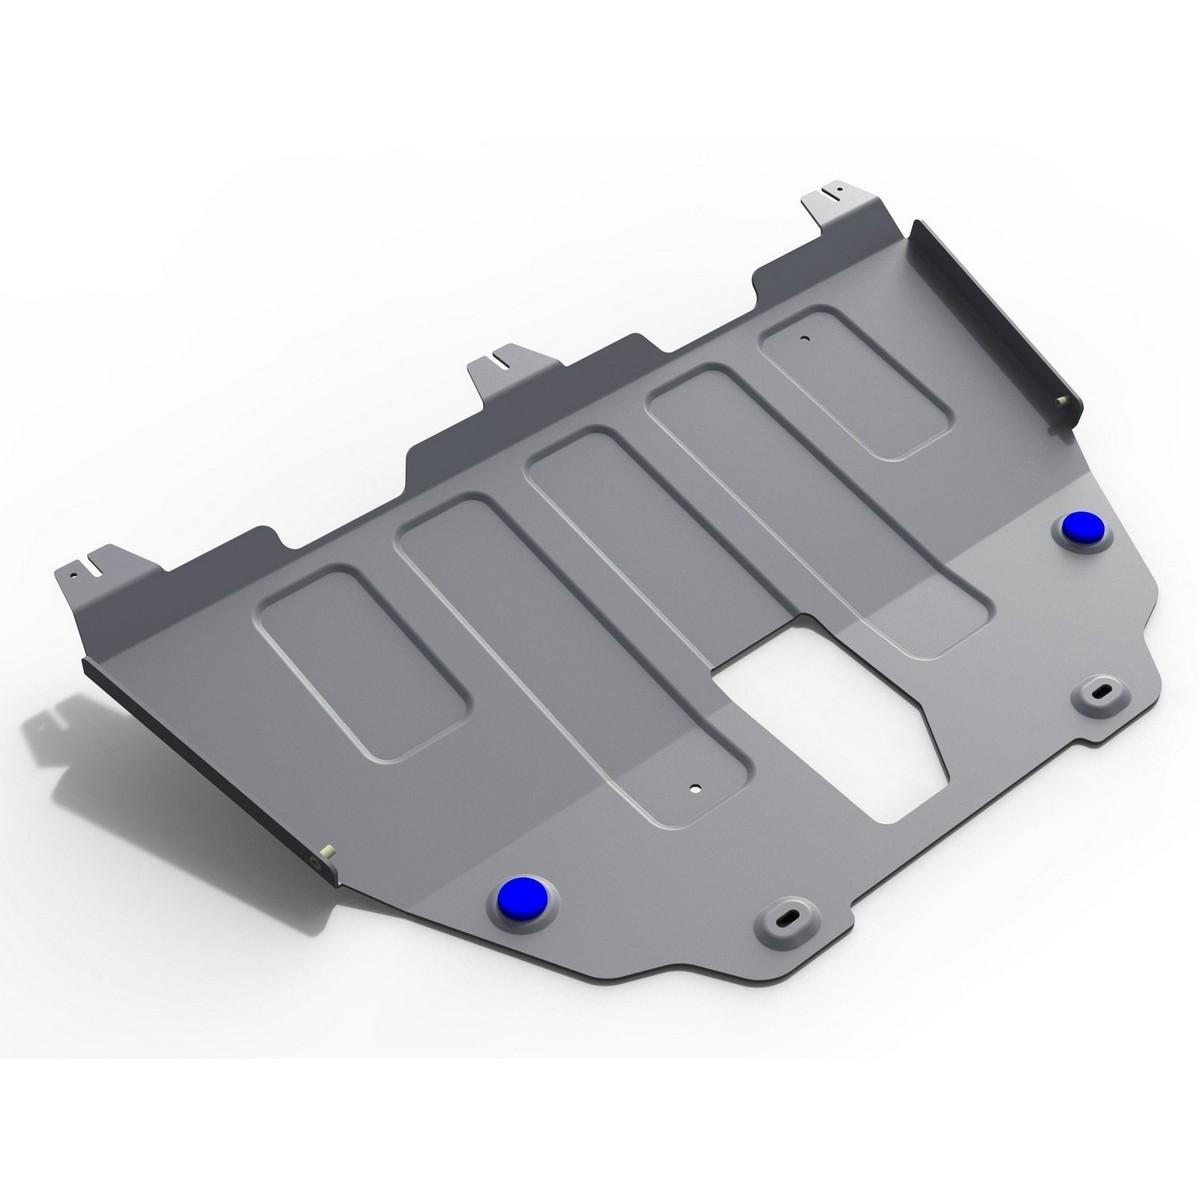 Защита картера и КПП Rival для Jeep Renegade 4WD 2015-н.в., алюминий 4 мм, с крепежом. 333.2736.1